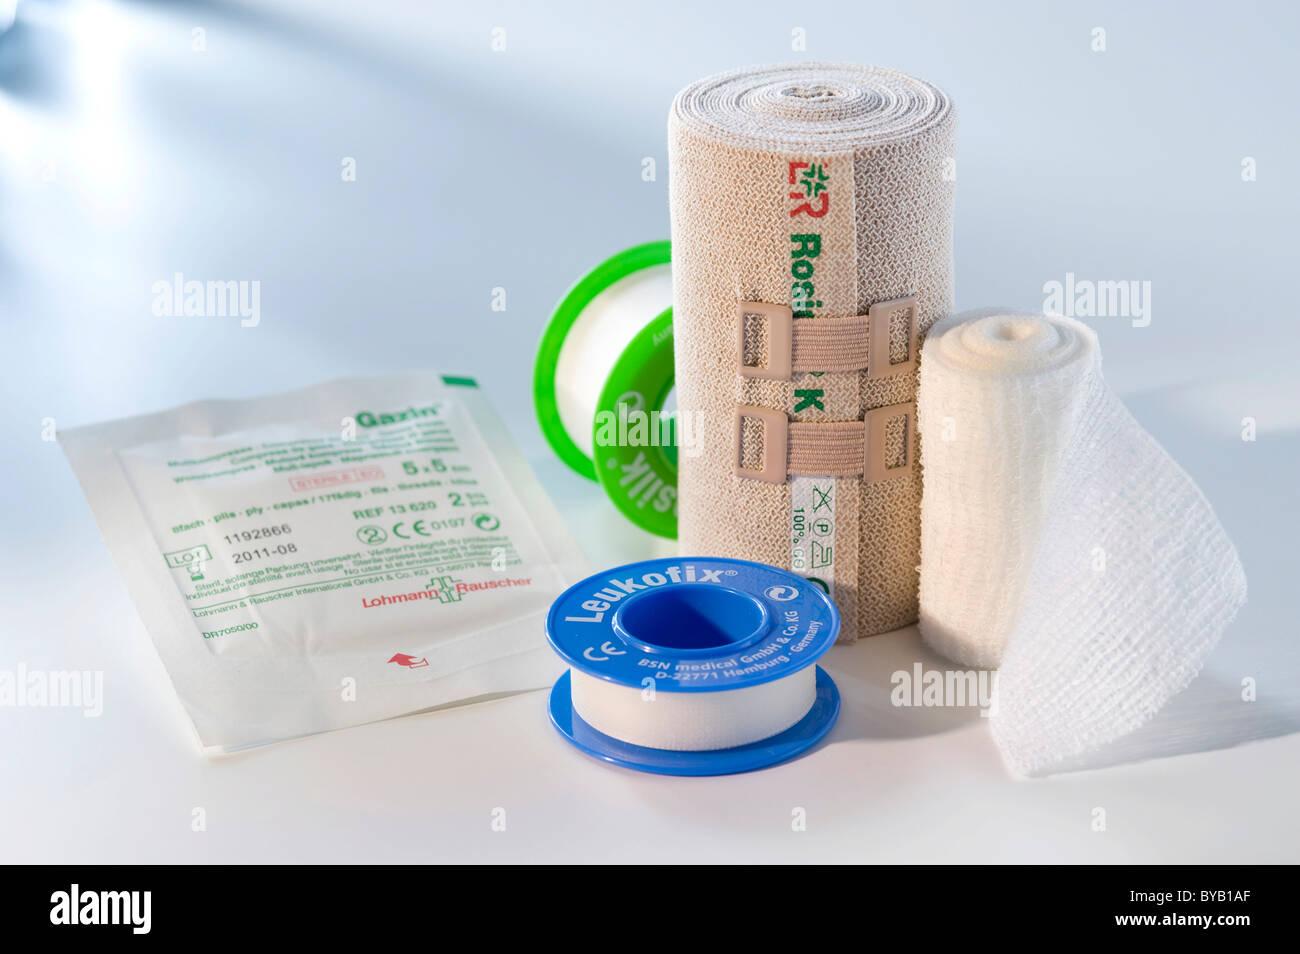 Dressing material, medical adhesive tape, plaster - Stock Image